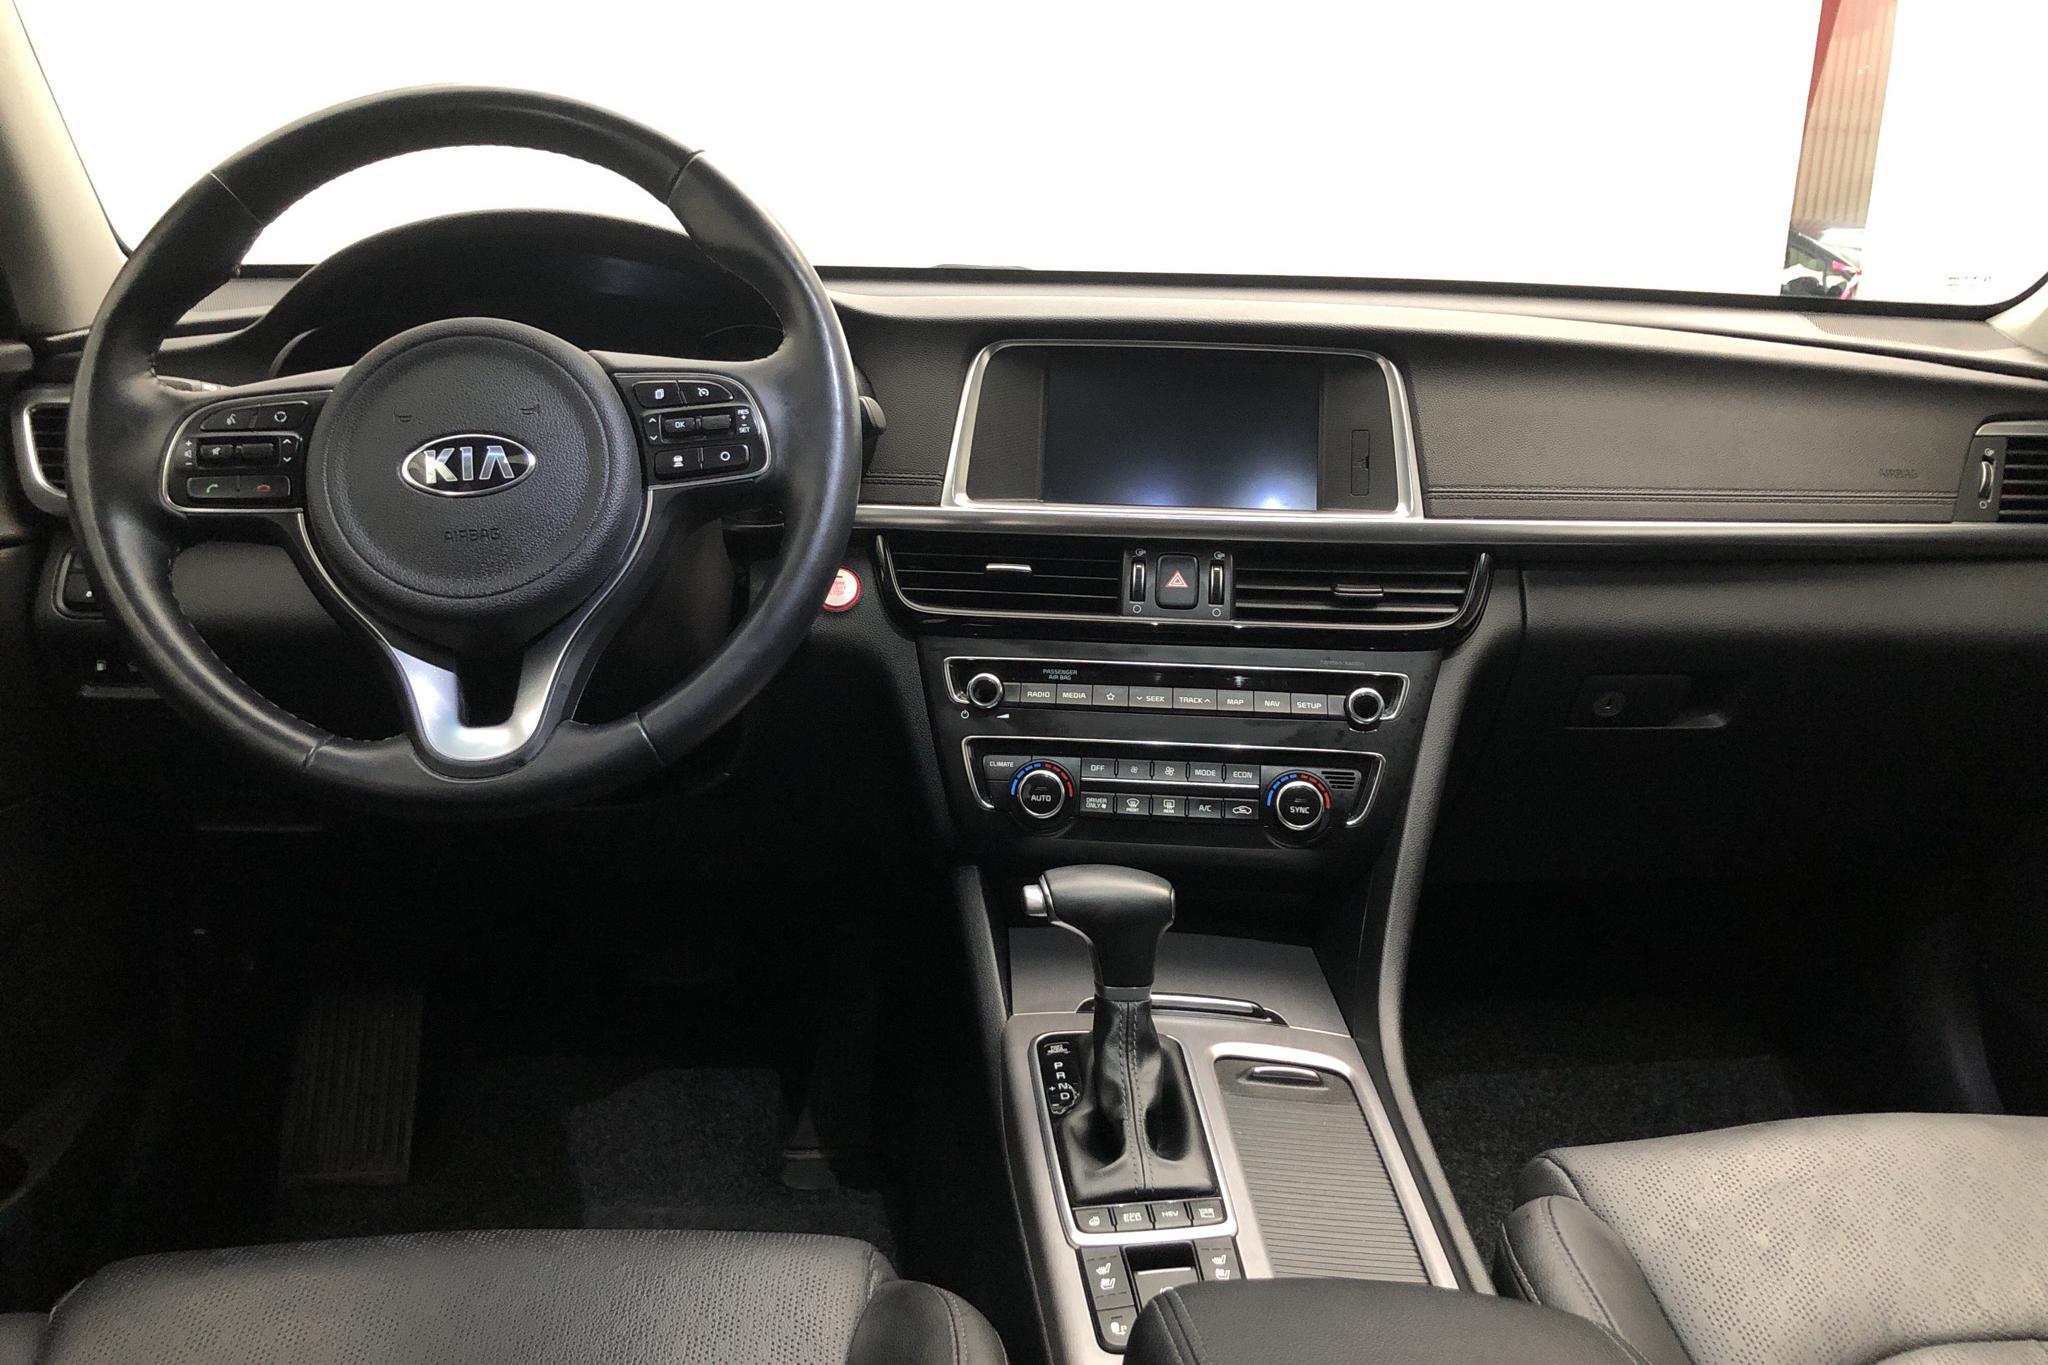 KIA Optima 2.0 GDi Plug-in Hybrid SW (205hk) - 5 302 mil - Automat - svart - 2018